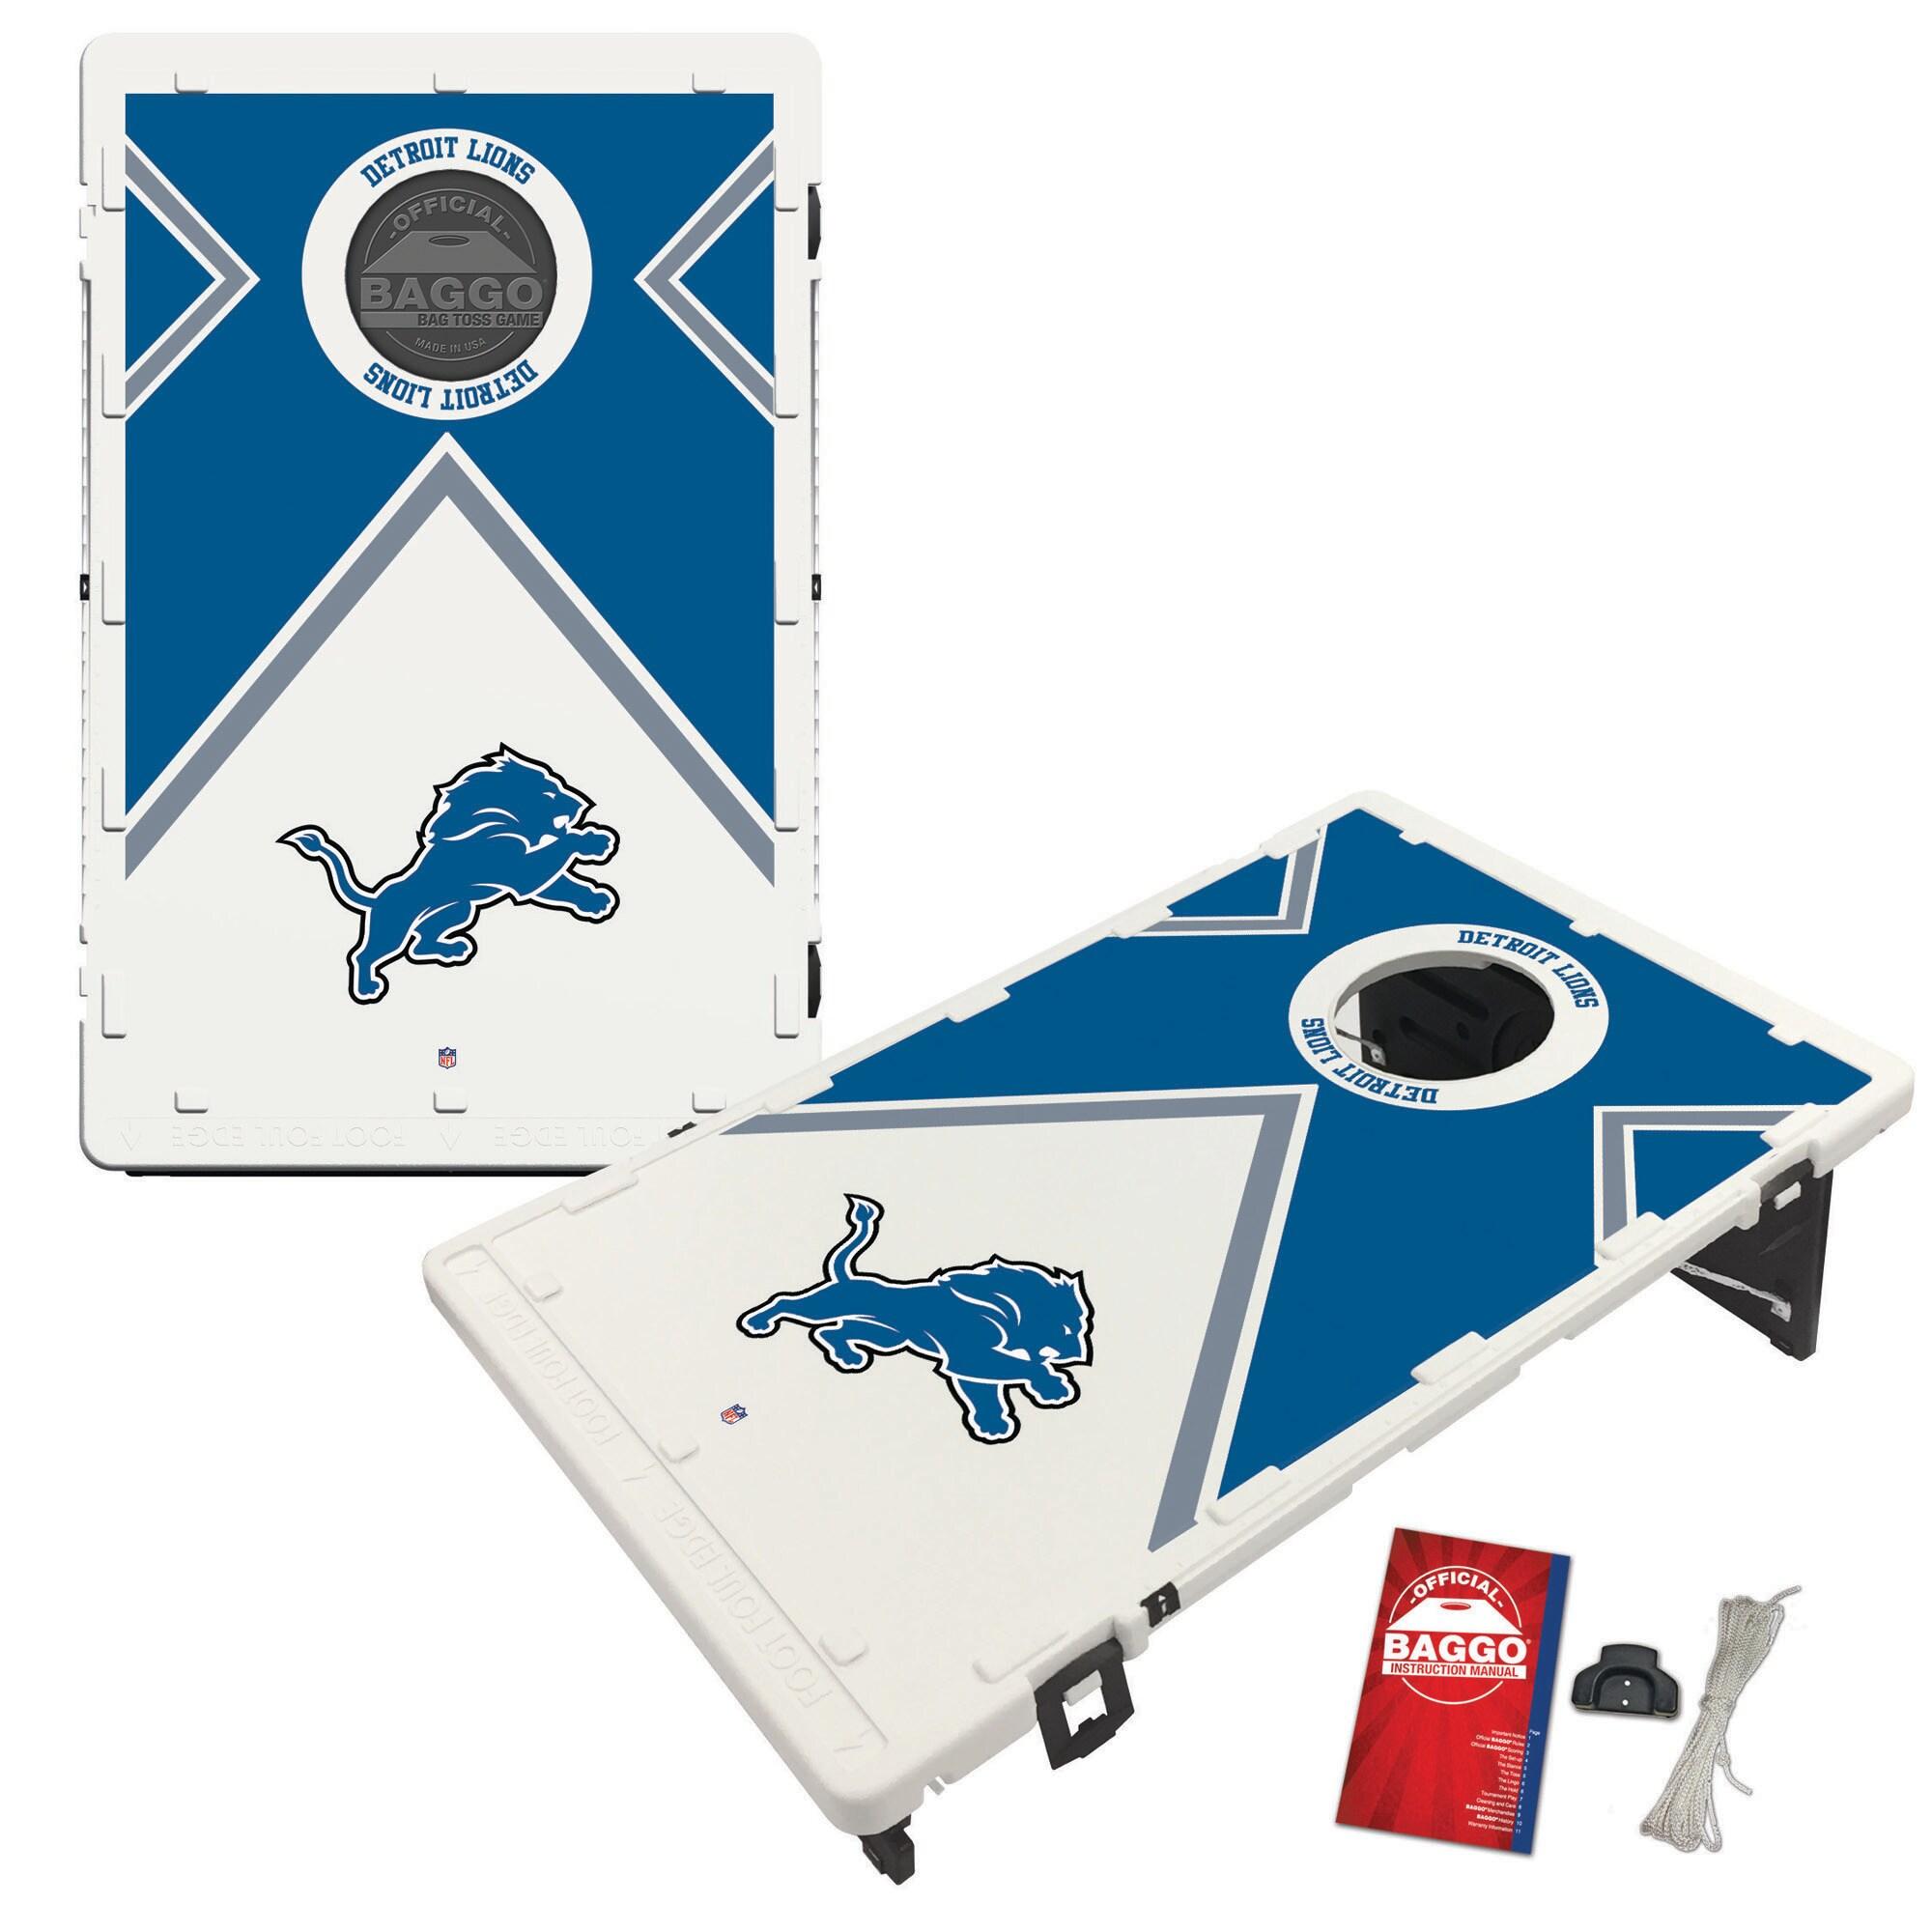 Detroit Lions 2' x 3' BAGGO Vintage Cornhole Board Tailgate Toss Set